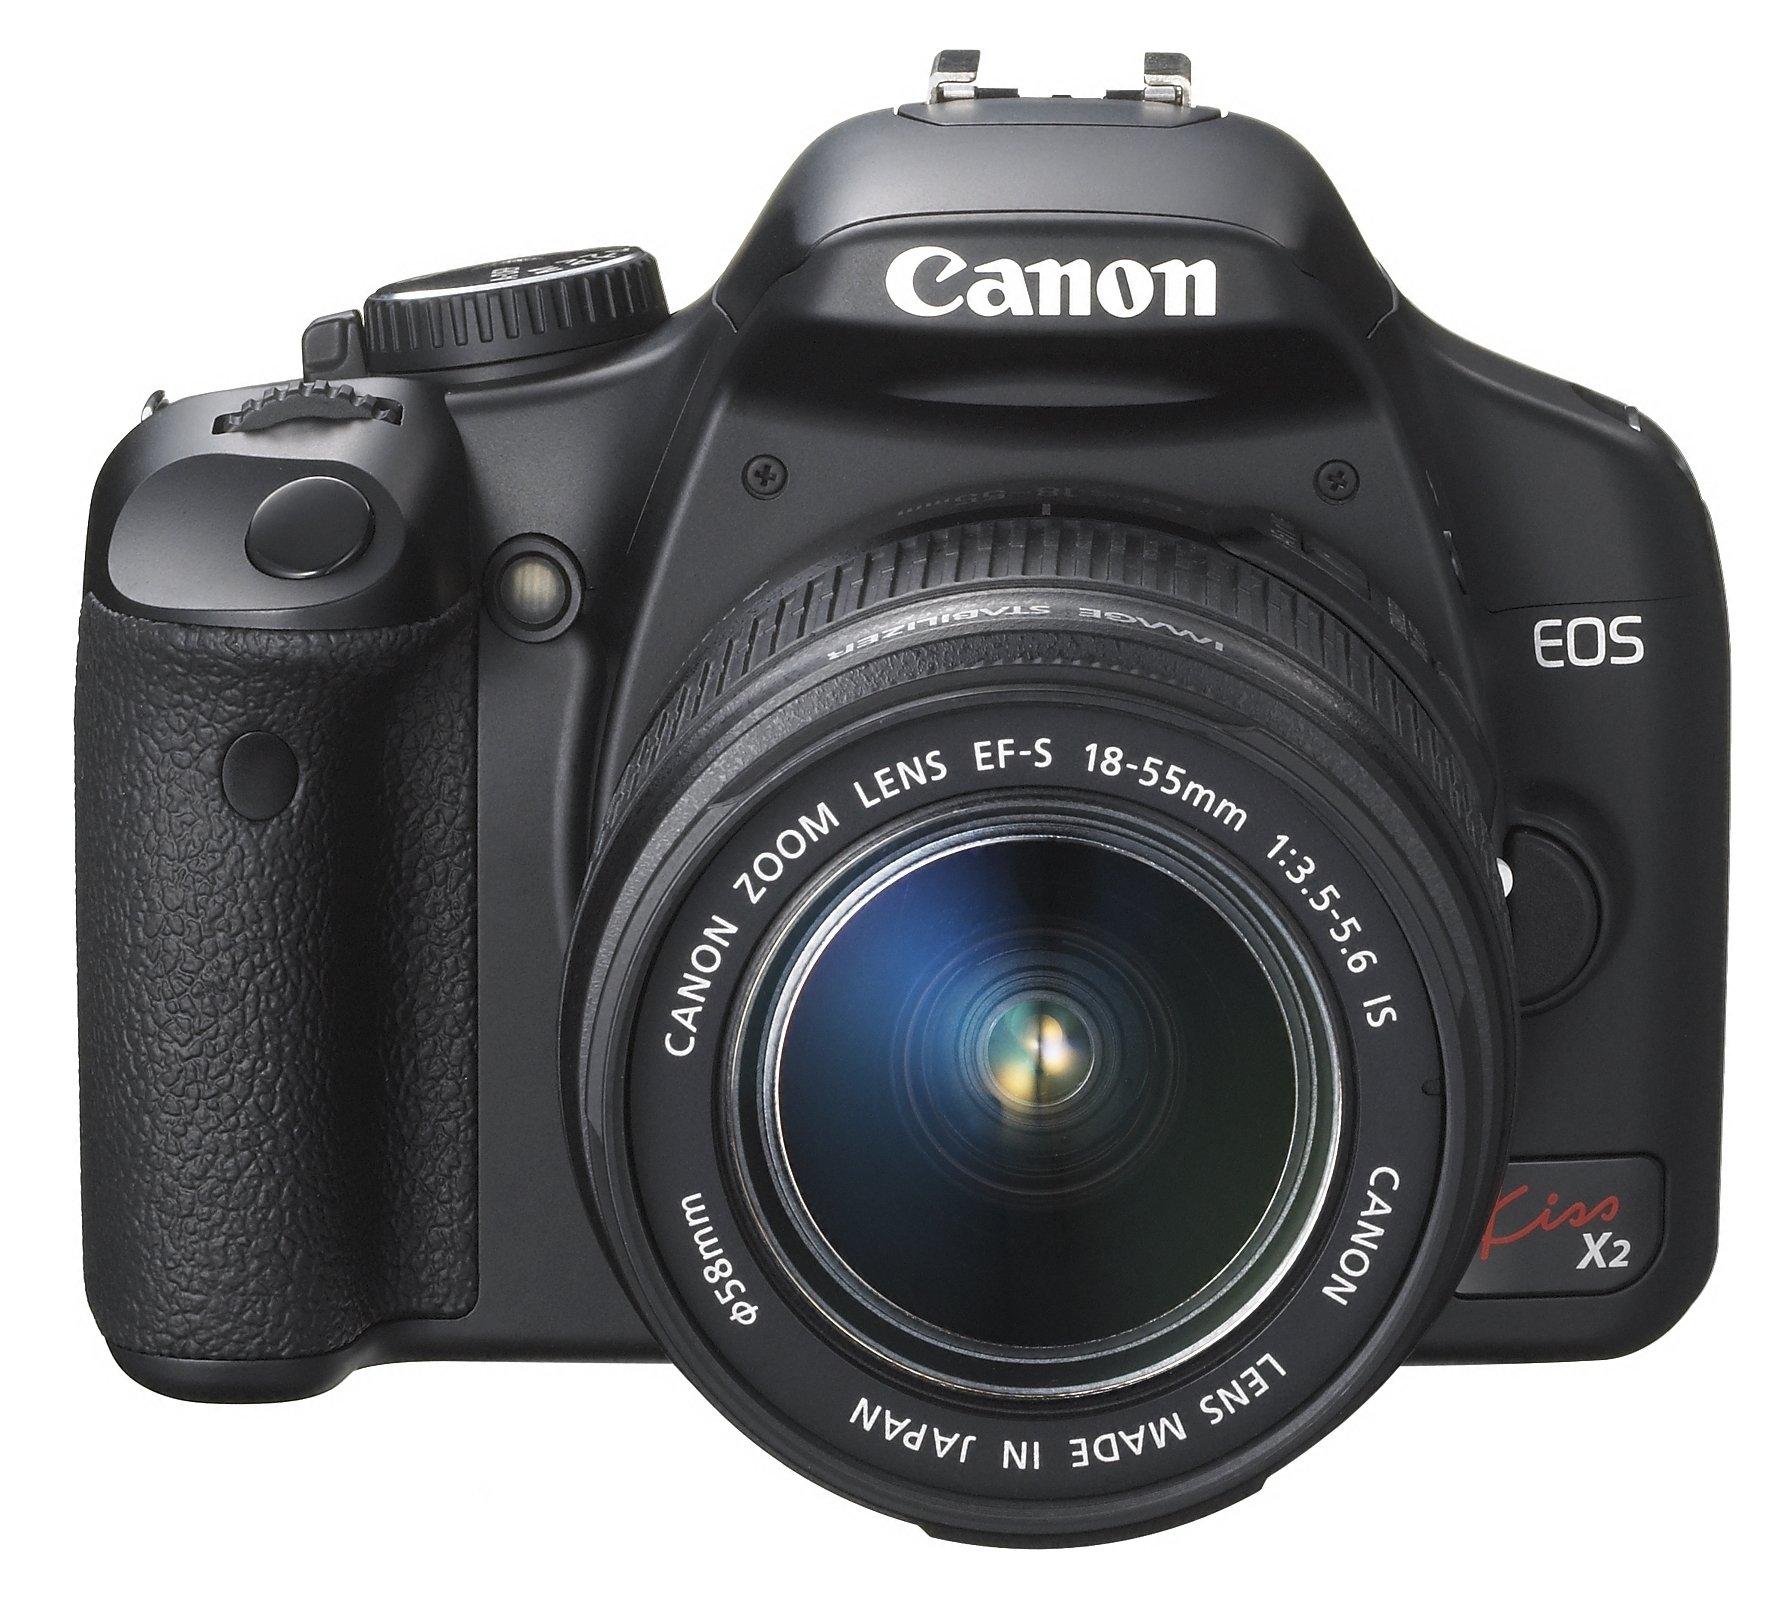 Canon デジタル一眼レフカメラ EOS Kiss X2 レンズキット KISSX2-LKIT product image